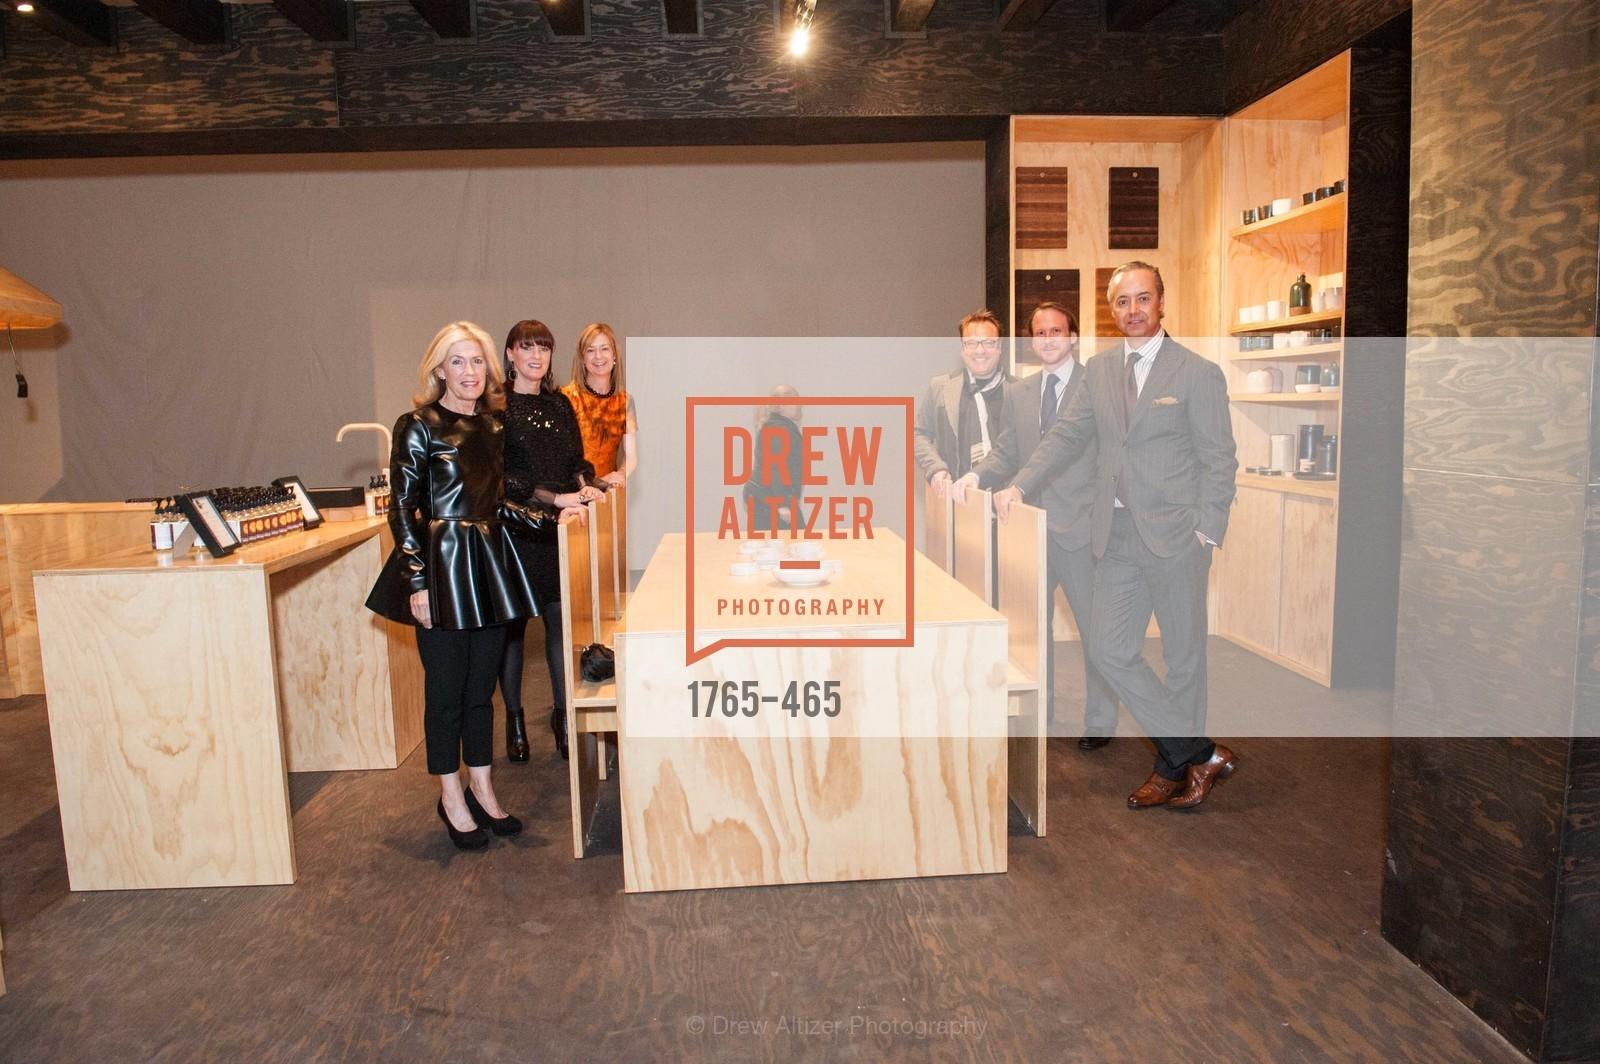 Cathy Topham, Allison Speer, Katie Schwab Paige, Stanlee Gatti, Roth Martin, Douglas Durkin, FOG Design + Art Preview Gala, US. US, January 16th, 2014